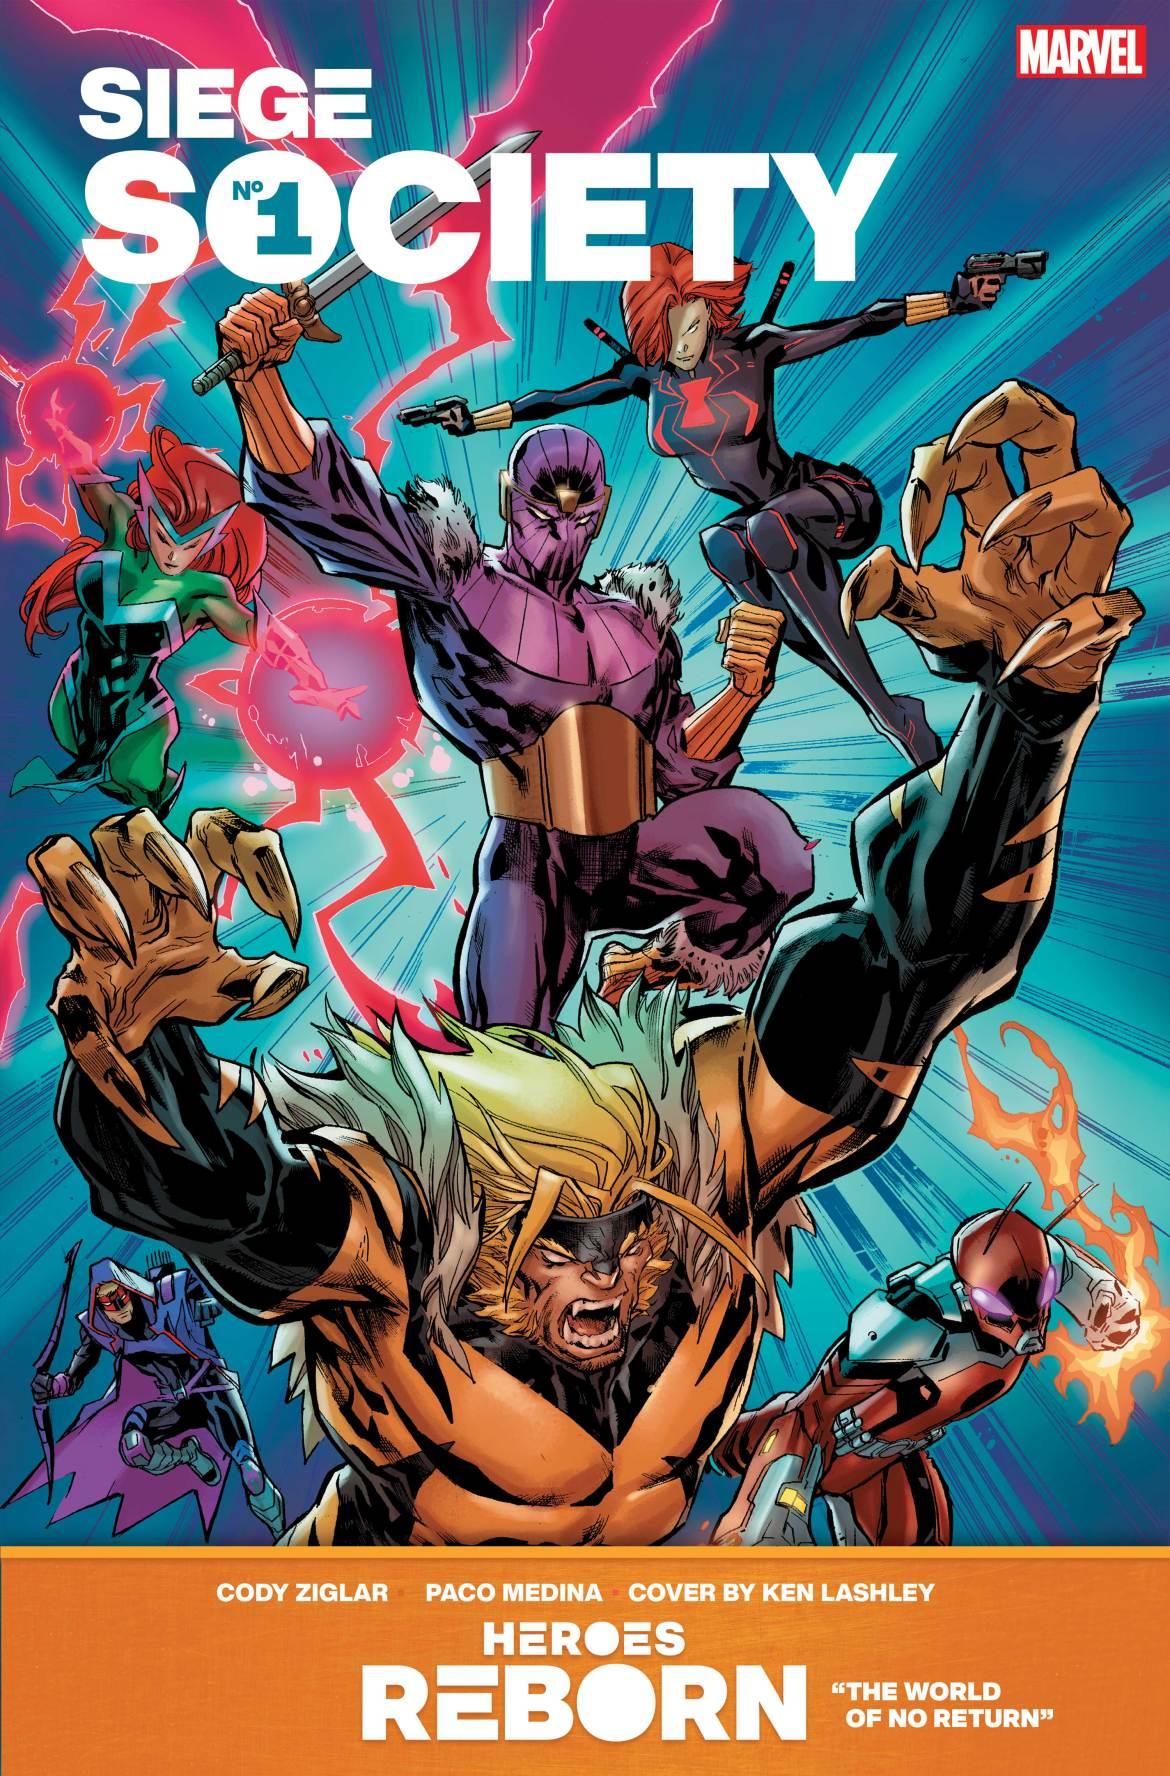 REBORN_SiegeSociety-1 Marvel Comics May 2021 Solicitations